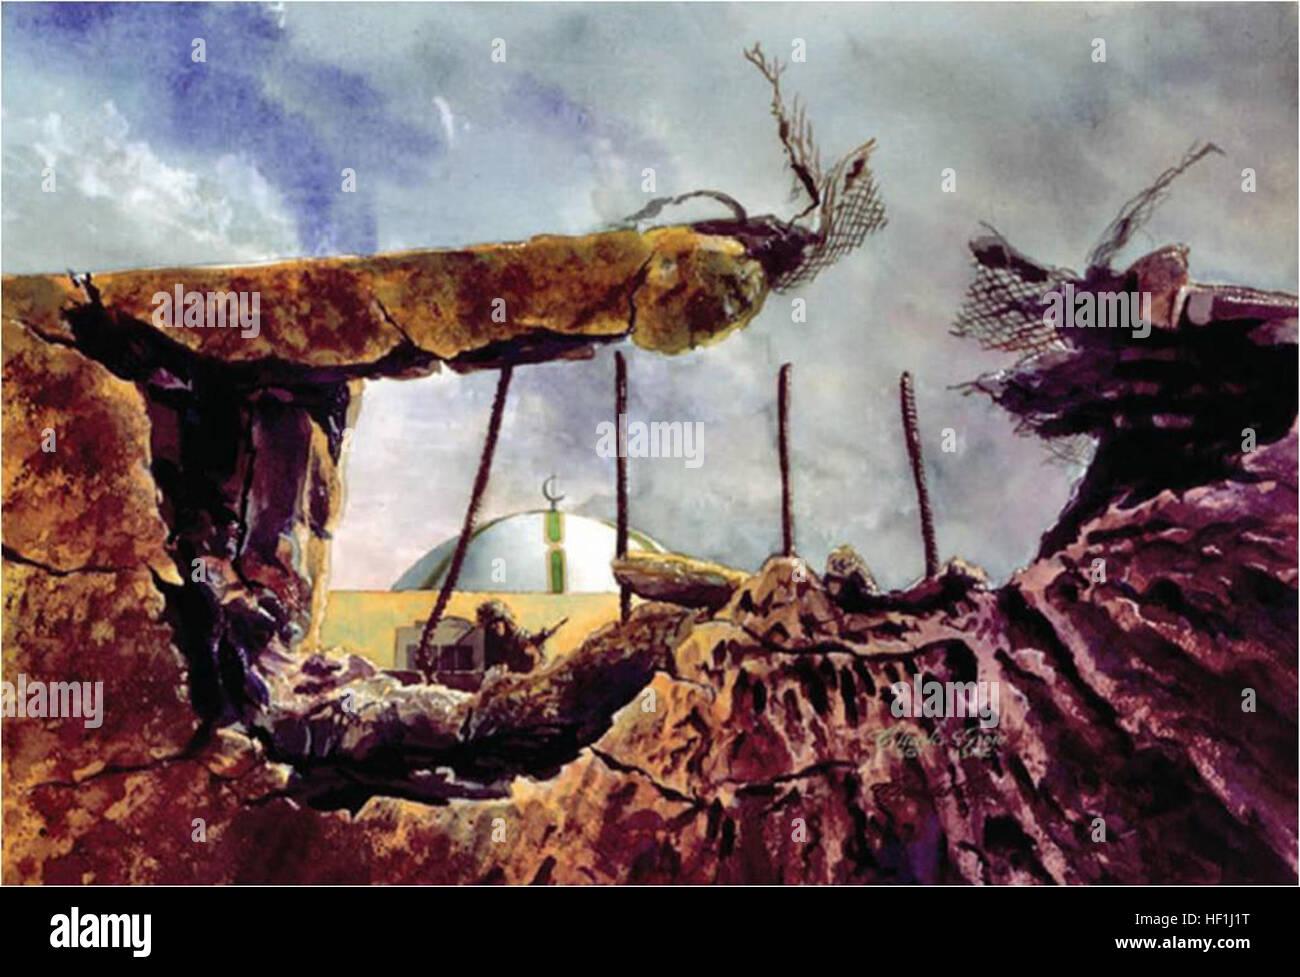 Cleaning up Khafji - Stock Image